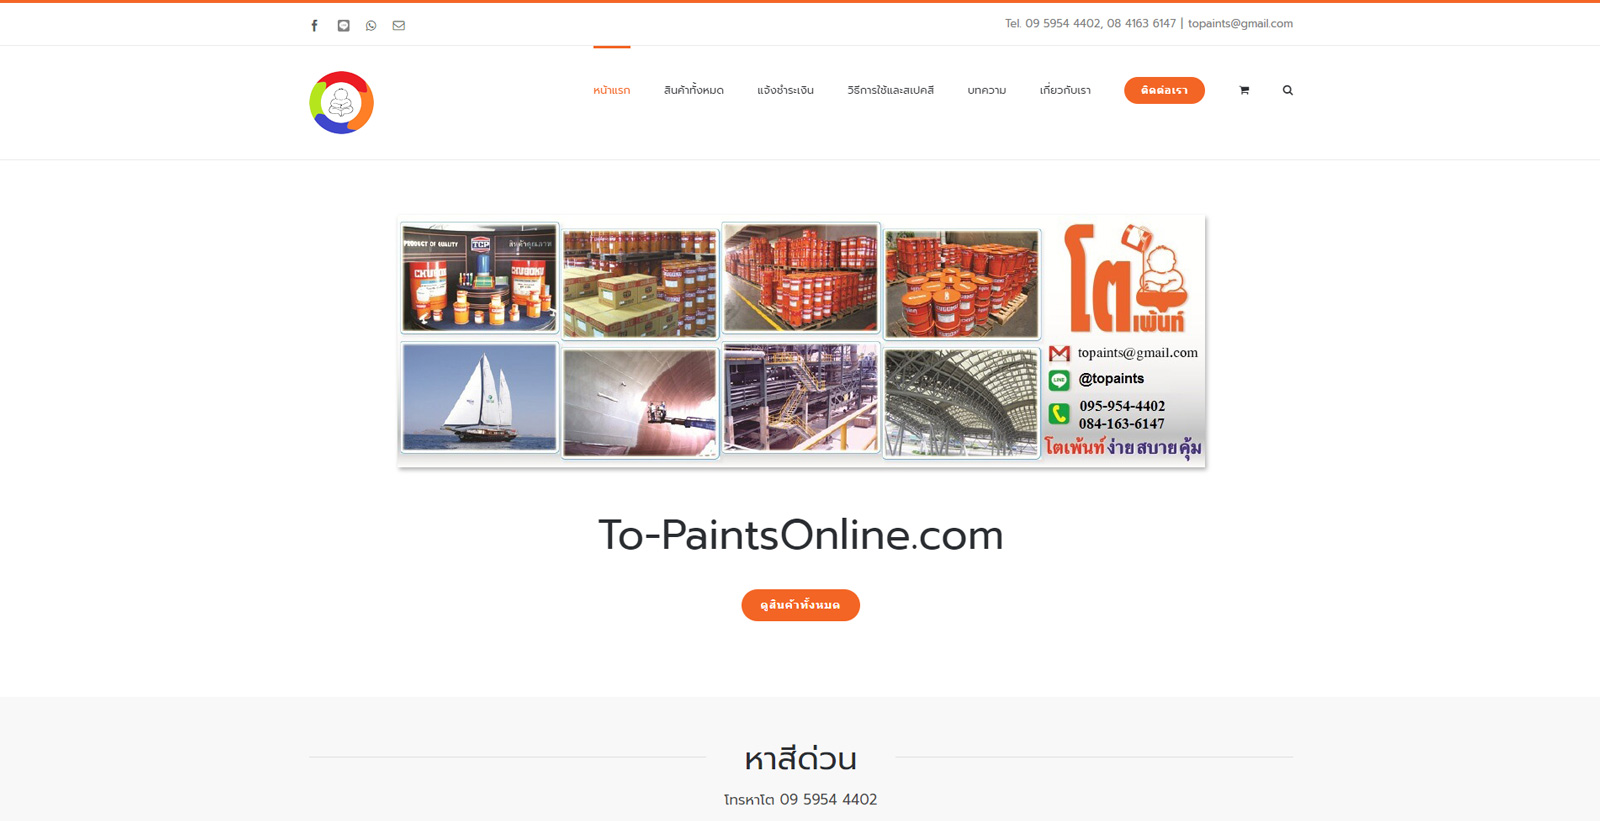 To-PaintsOnline